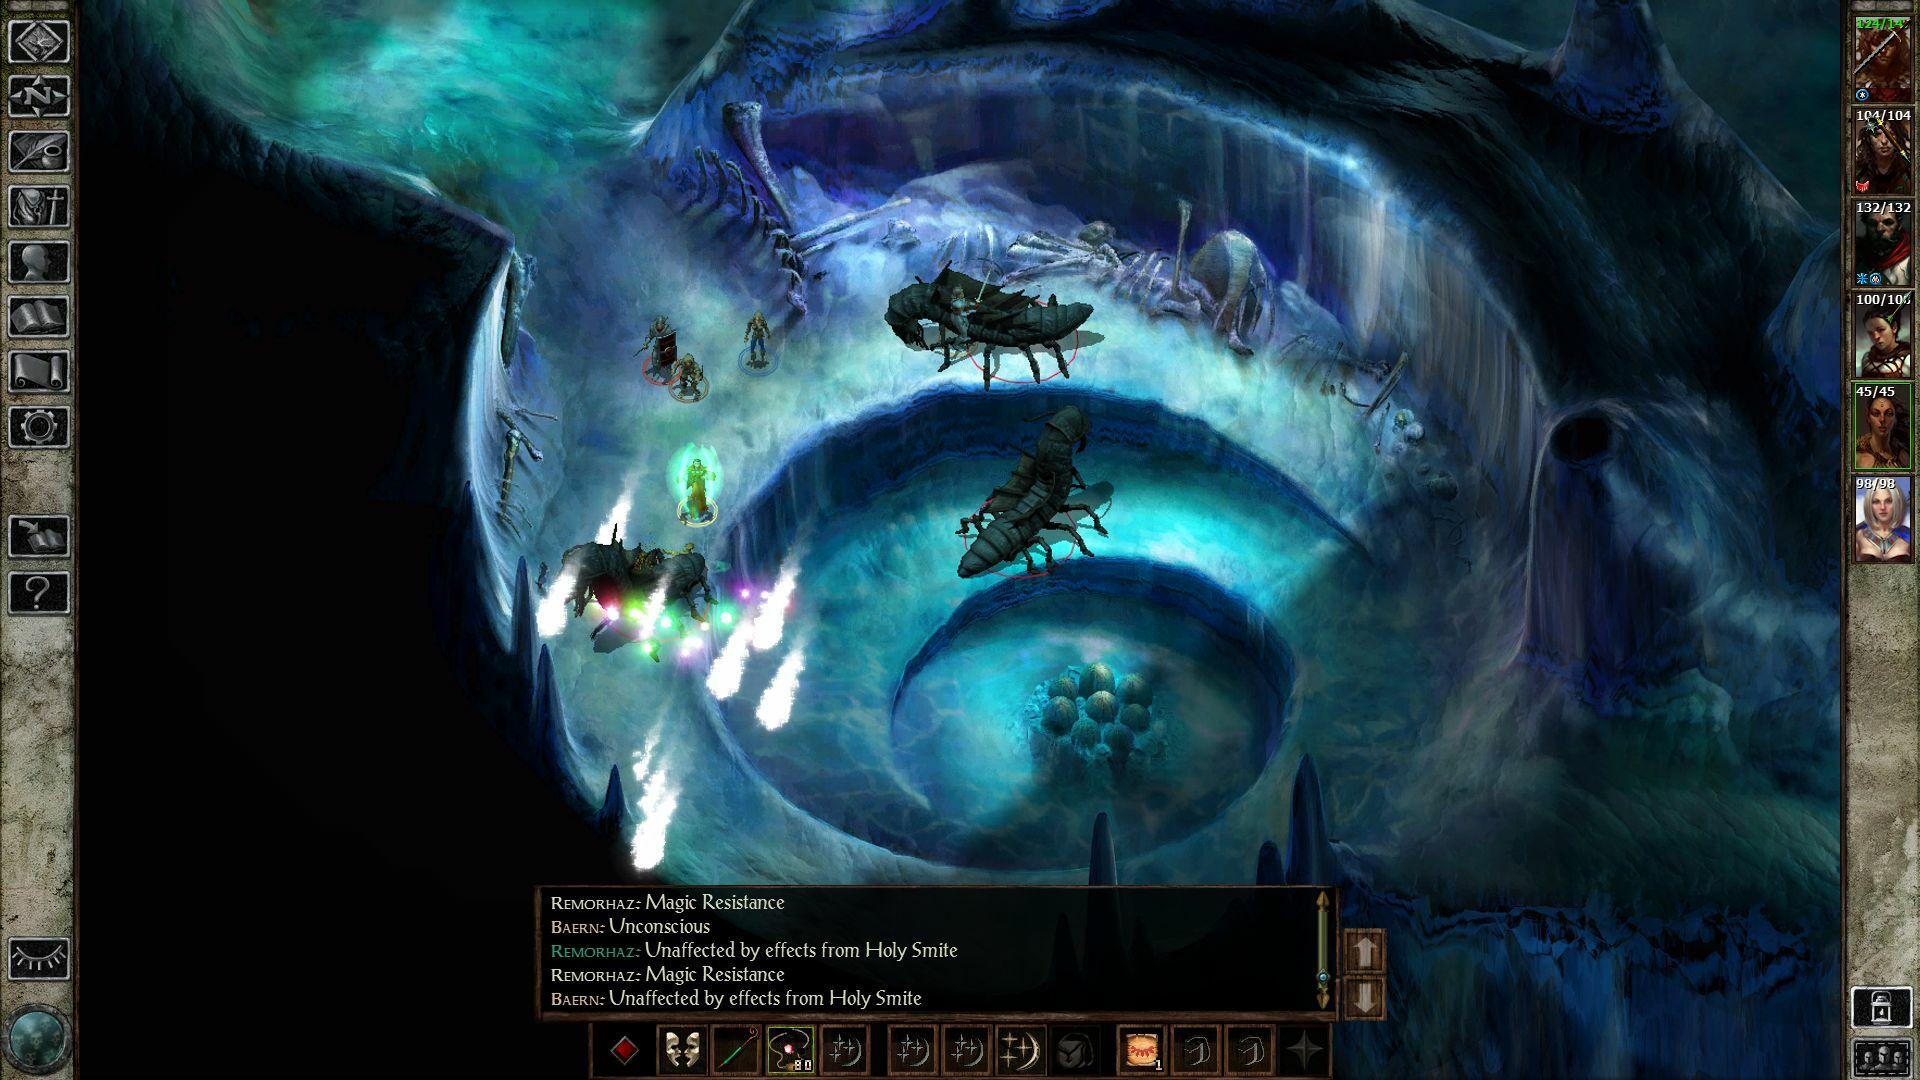 sicewind-dale-enhanced-edition-pc-creenshot-4